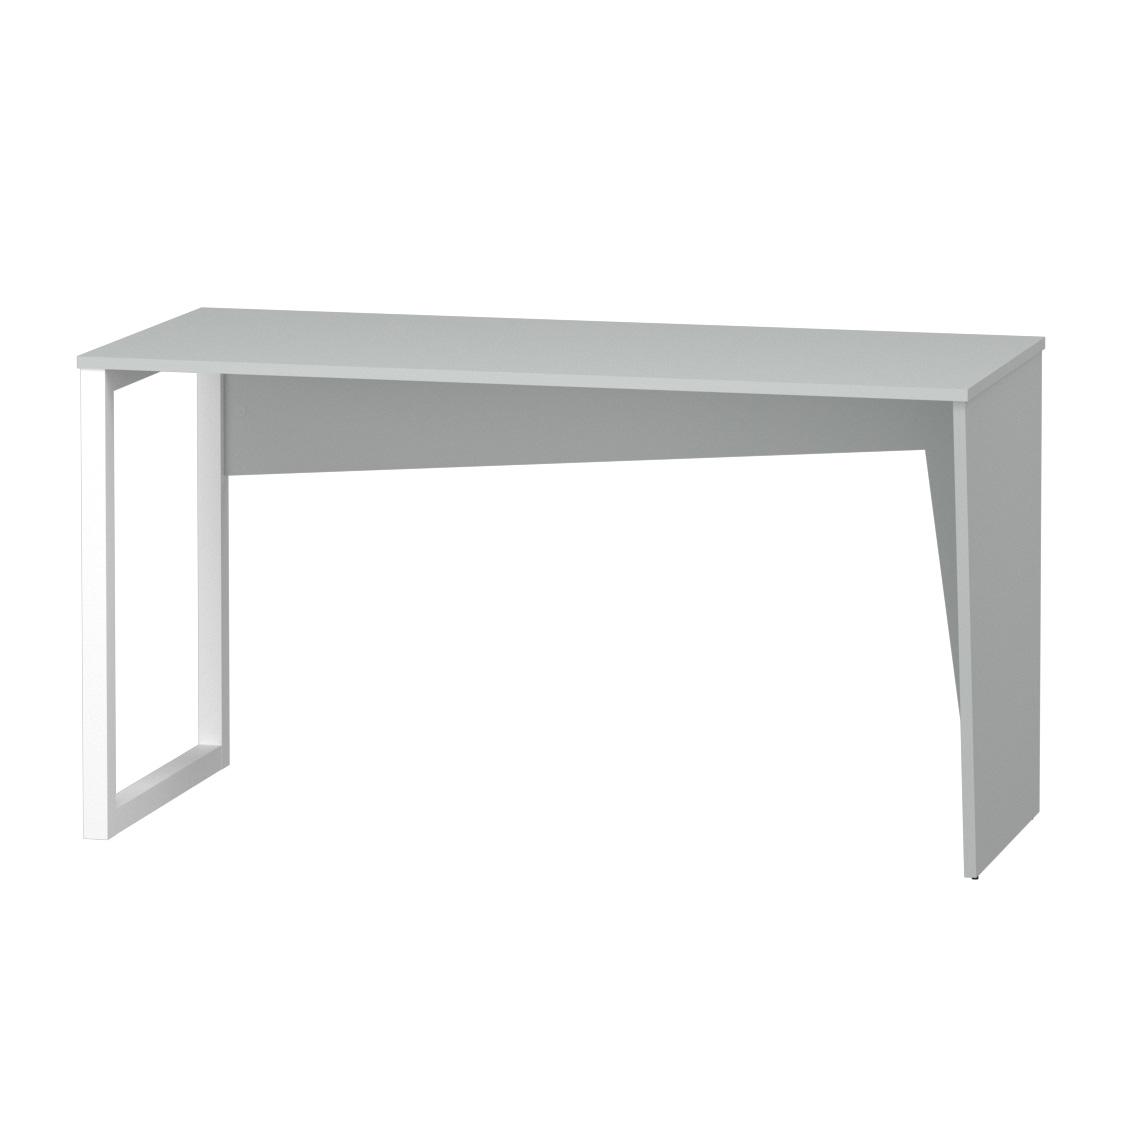 Bianco / Stone gray